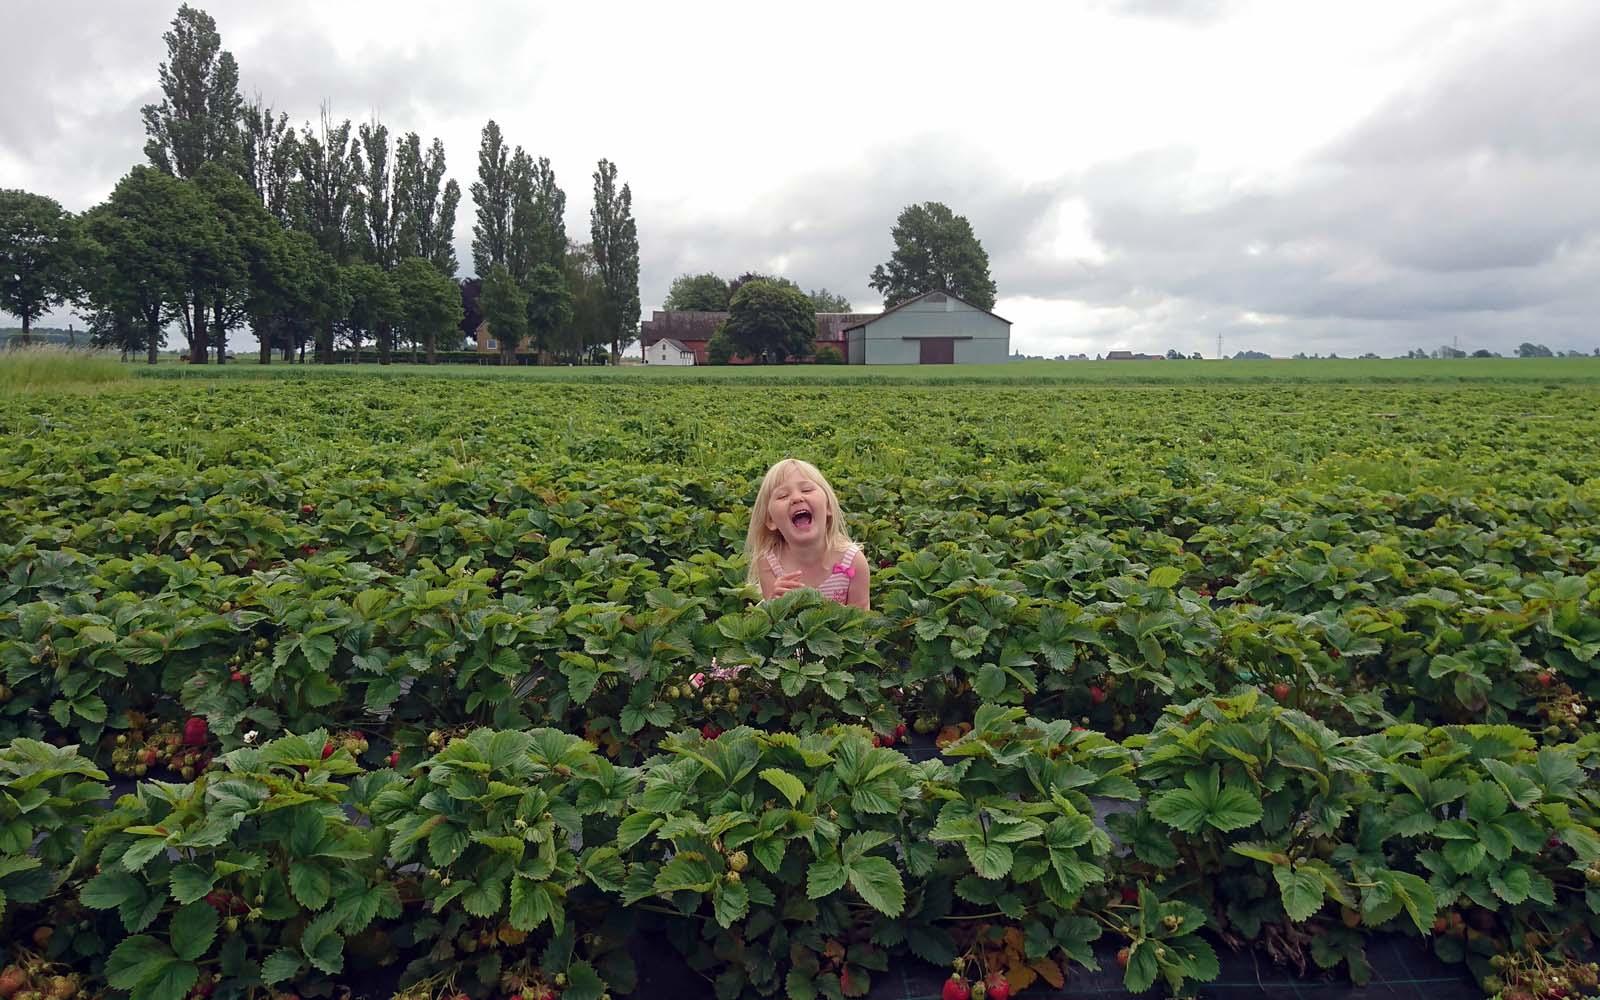 Lilla Ingrid leker bland jordgubbsplantorna